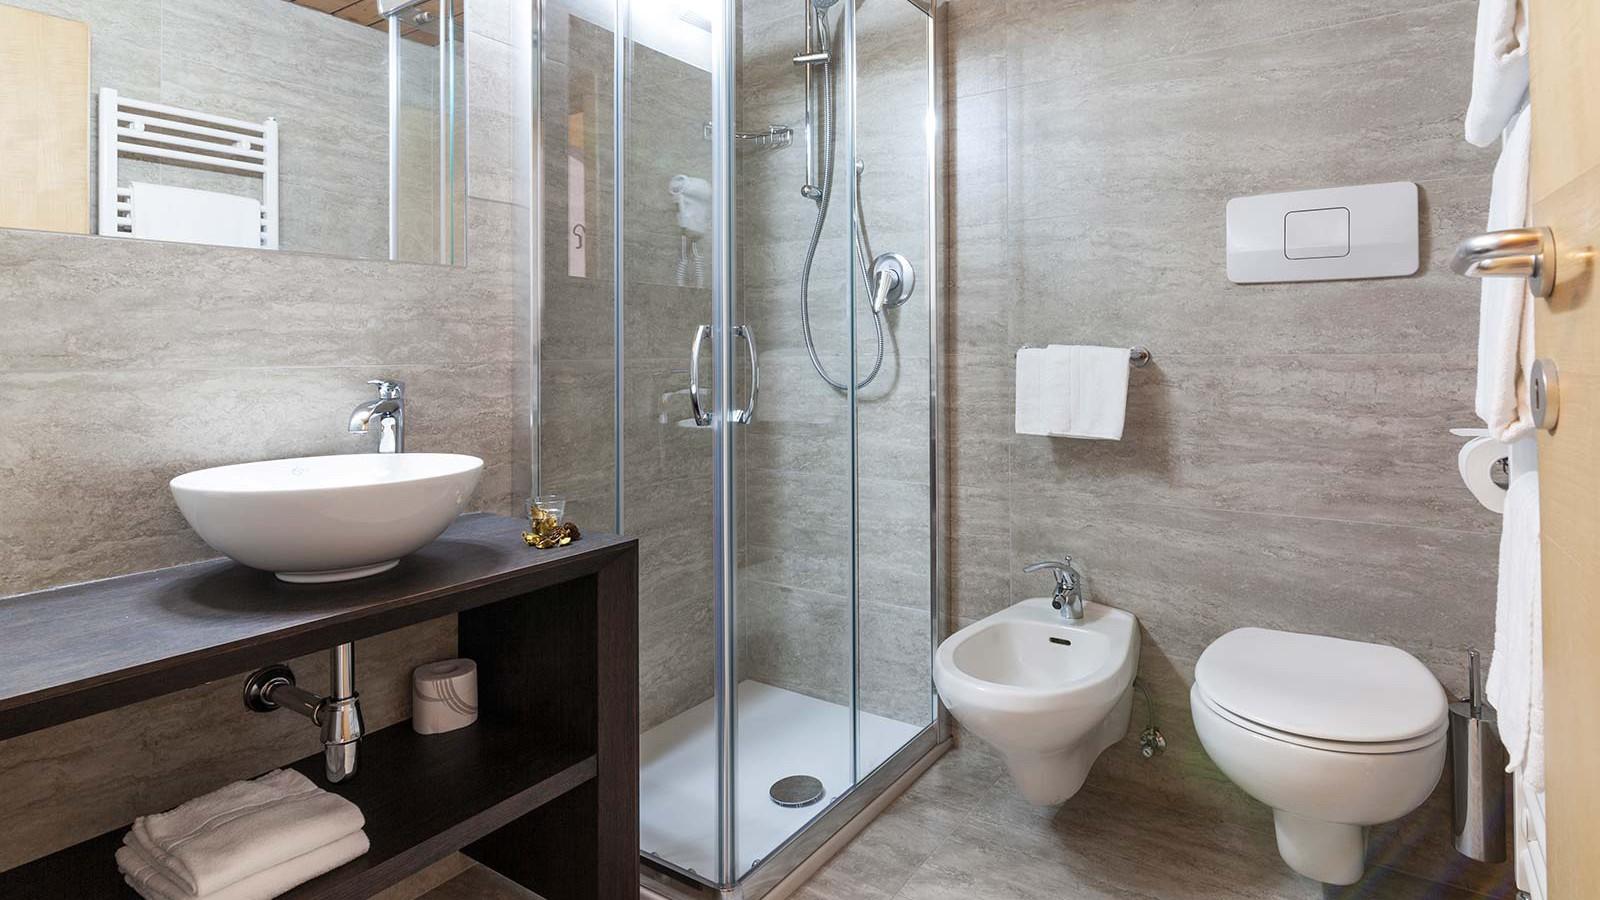 Hotel Alpin Haus, Selva Val Gardena - Bathroom - Standard Room